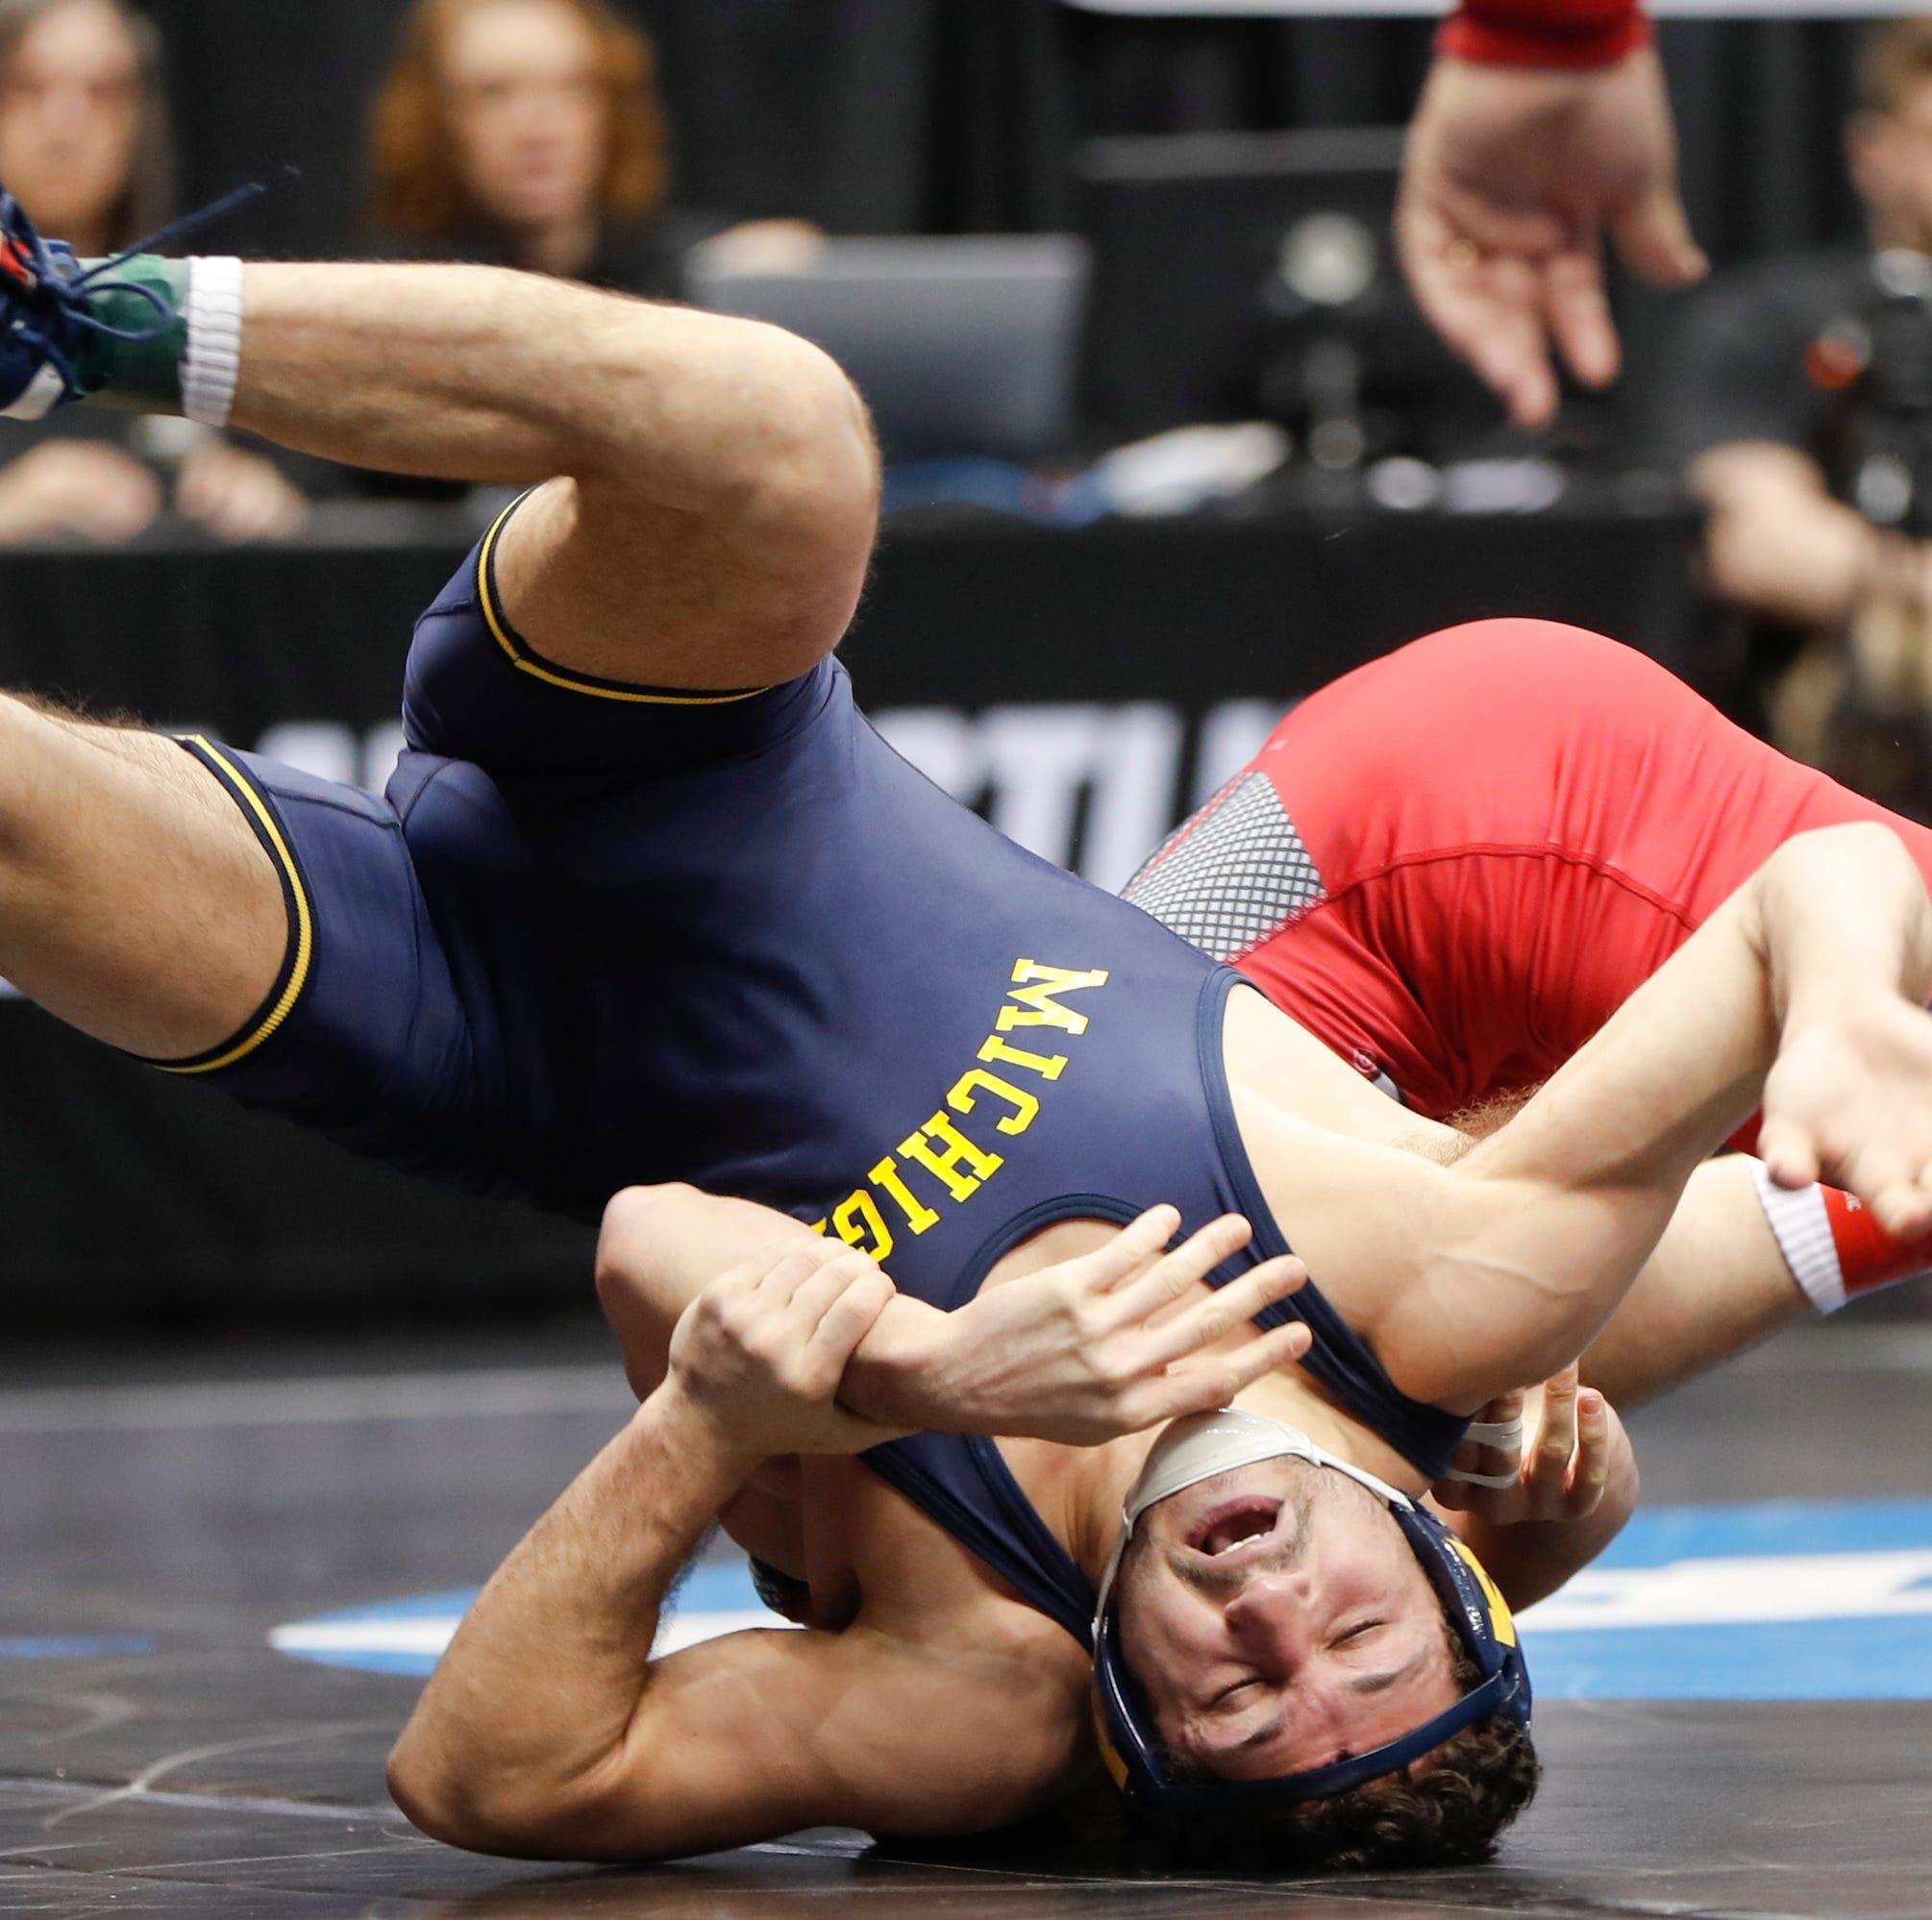 NCAA wrestling championships 2019: Sebastian Rivera comes back to finish third